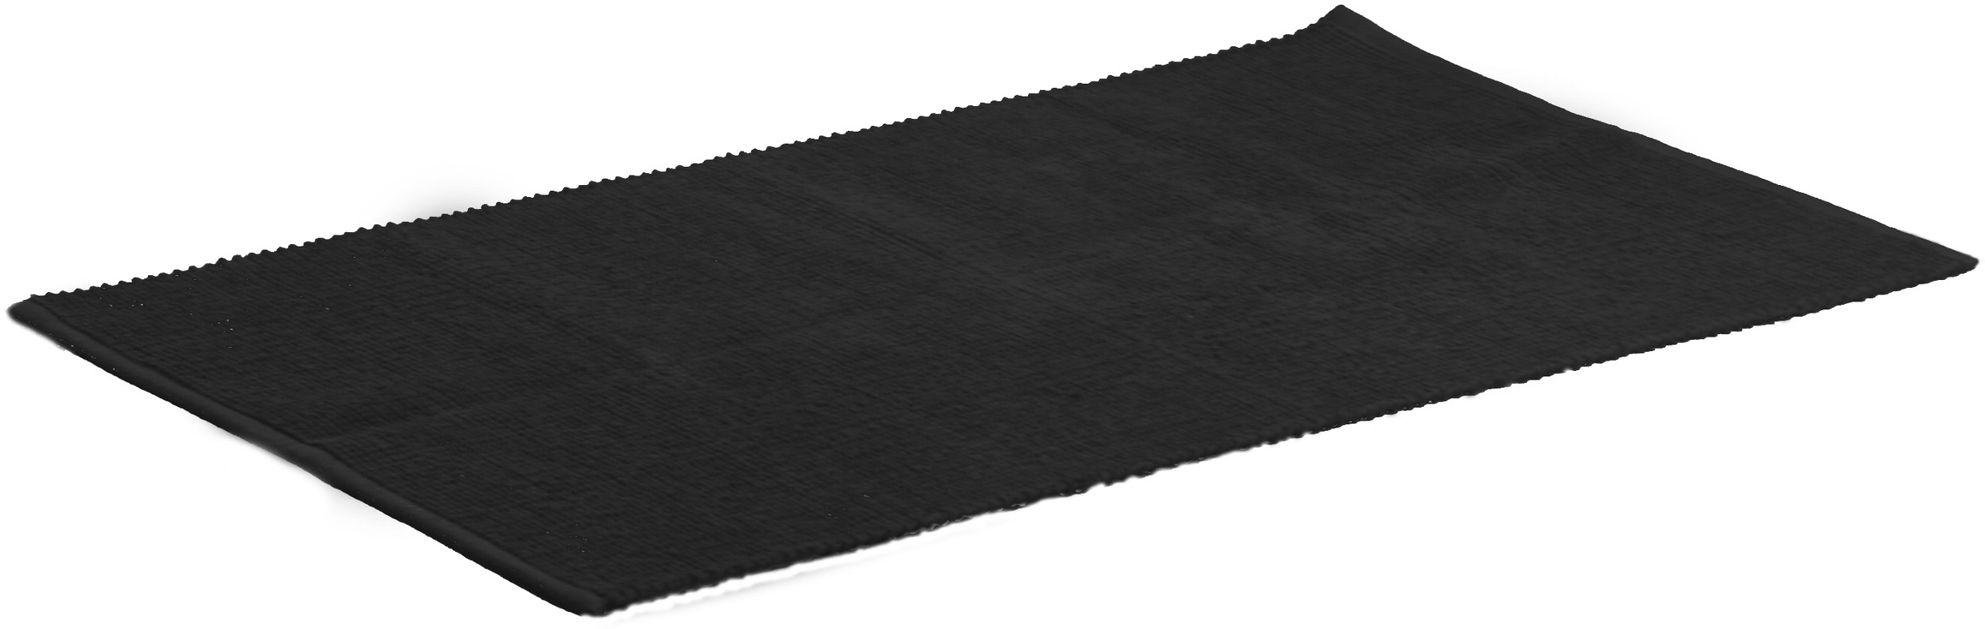 sabichi-woven-chenille-rug-90x150cm-black